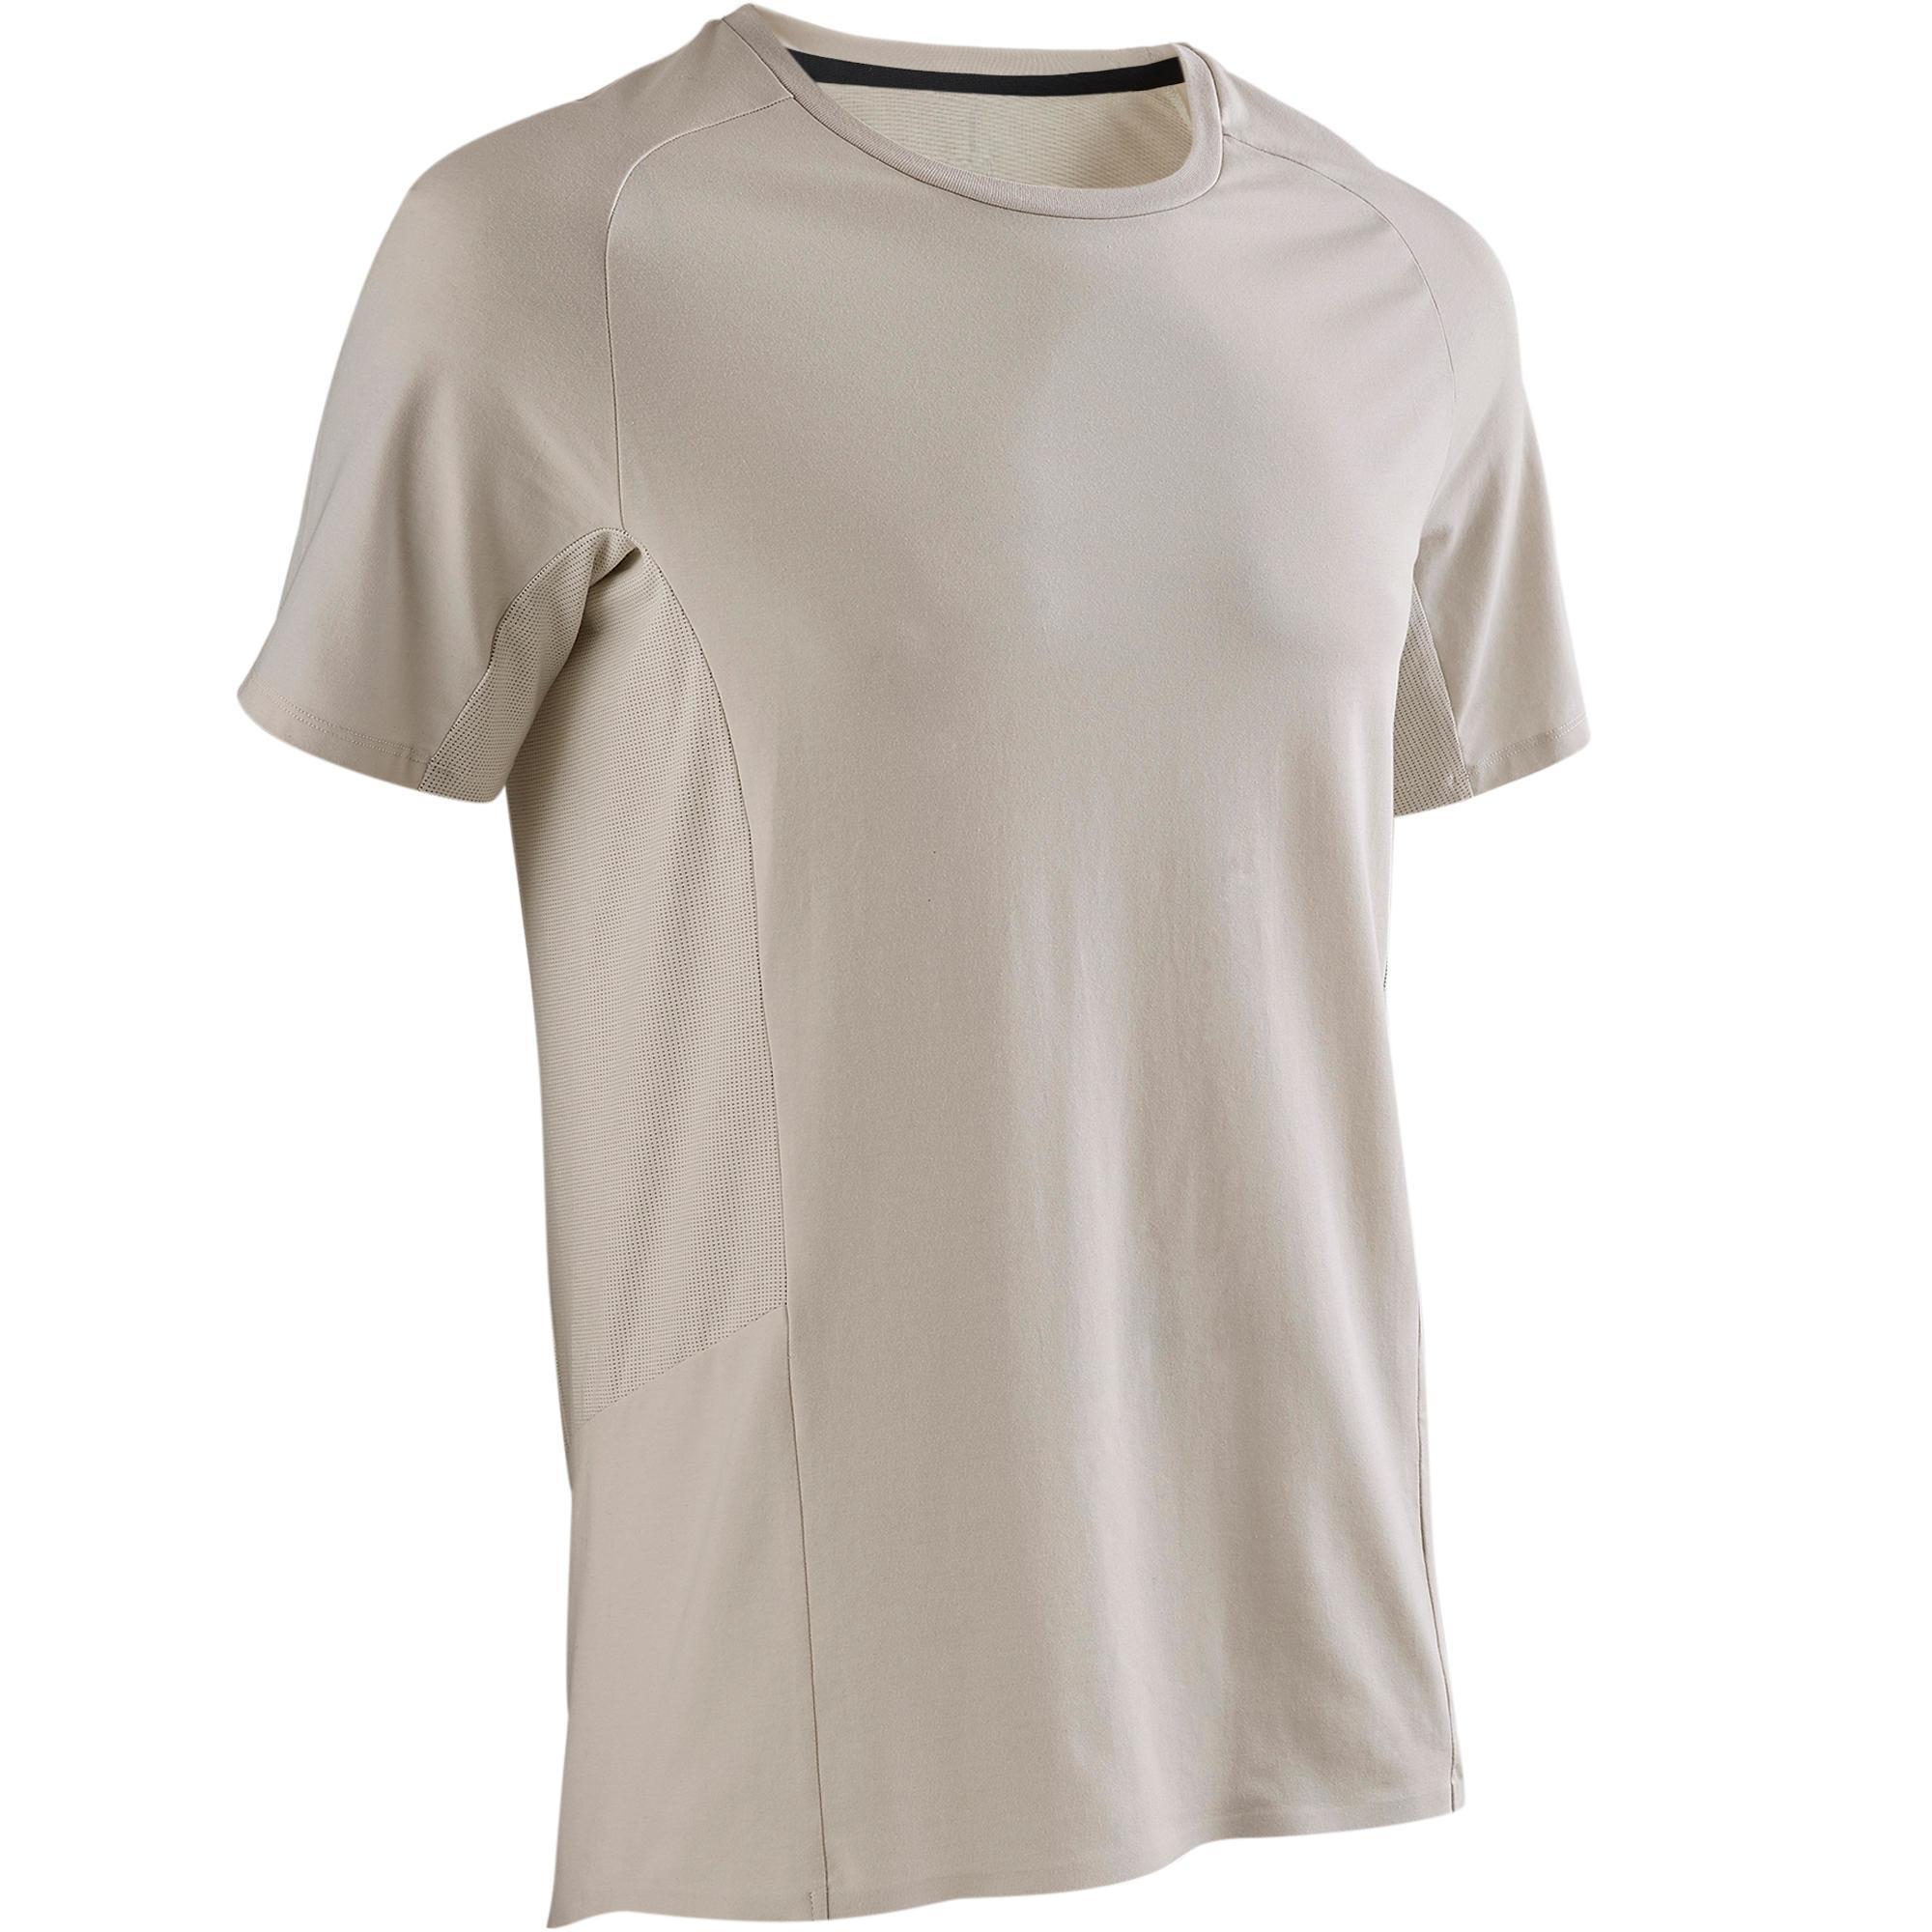 T shirt homme 560 beige domyos